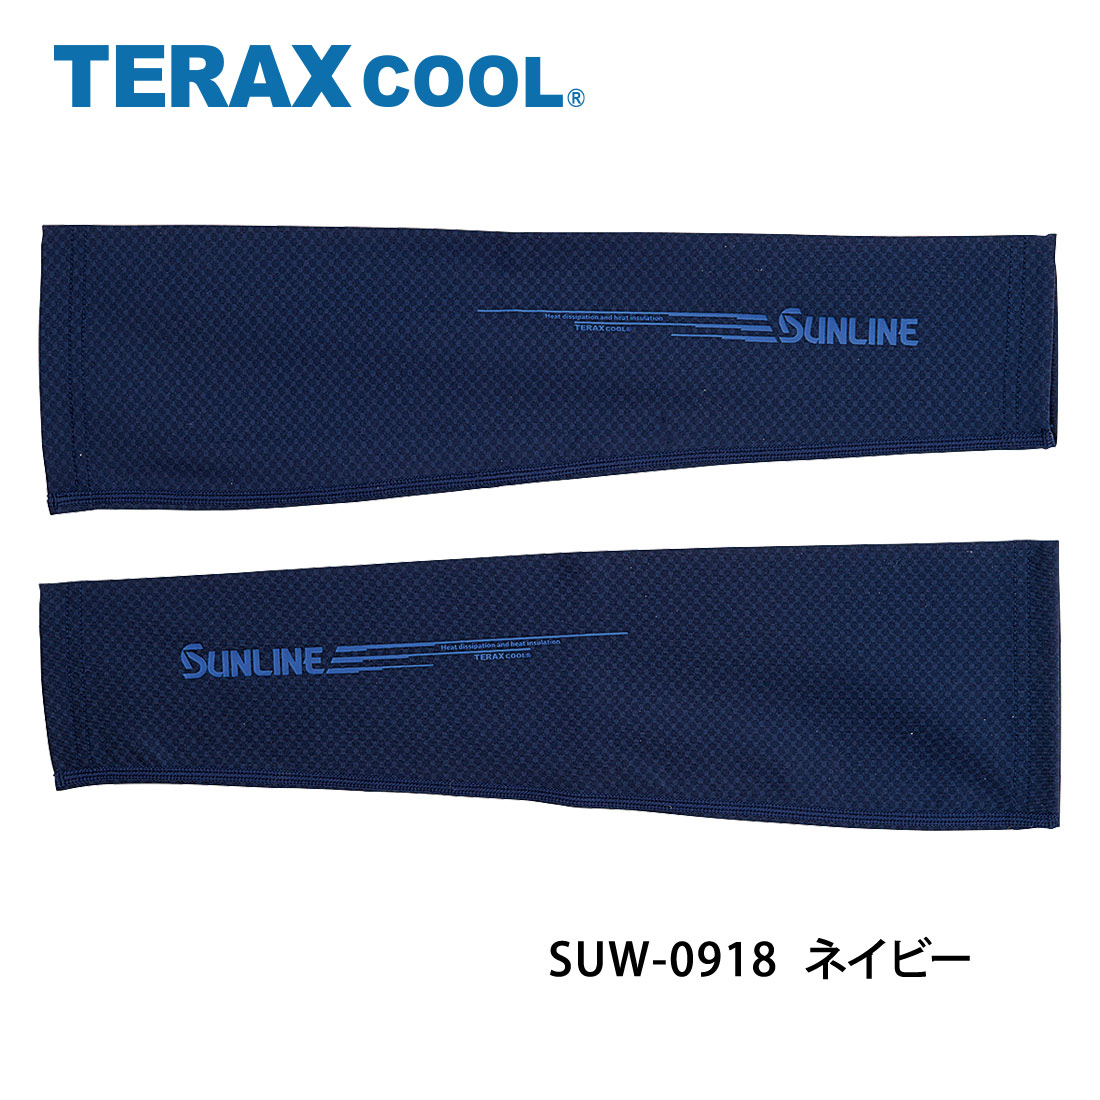 TERAX COOL DRY アームカバー SUW-0918